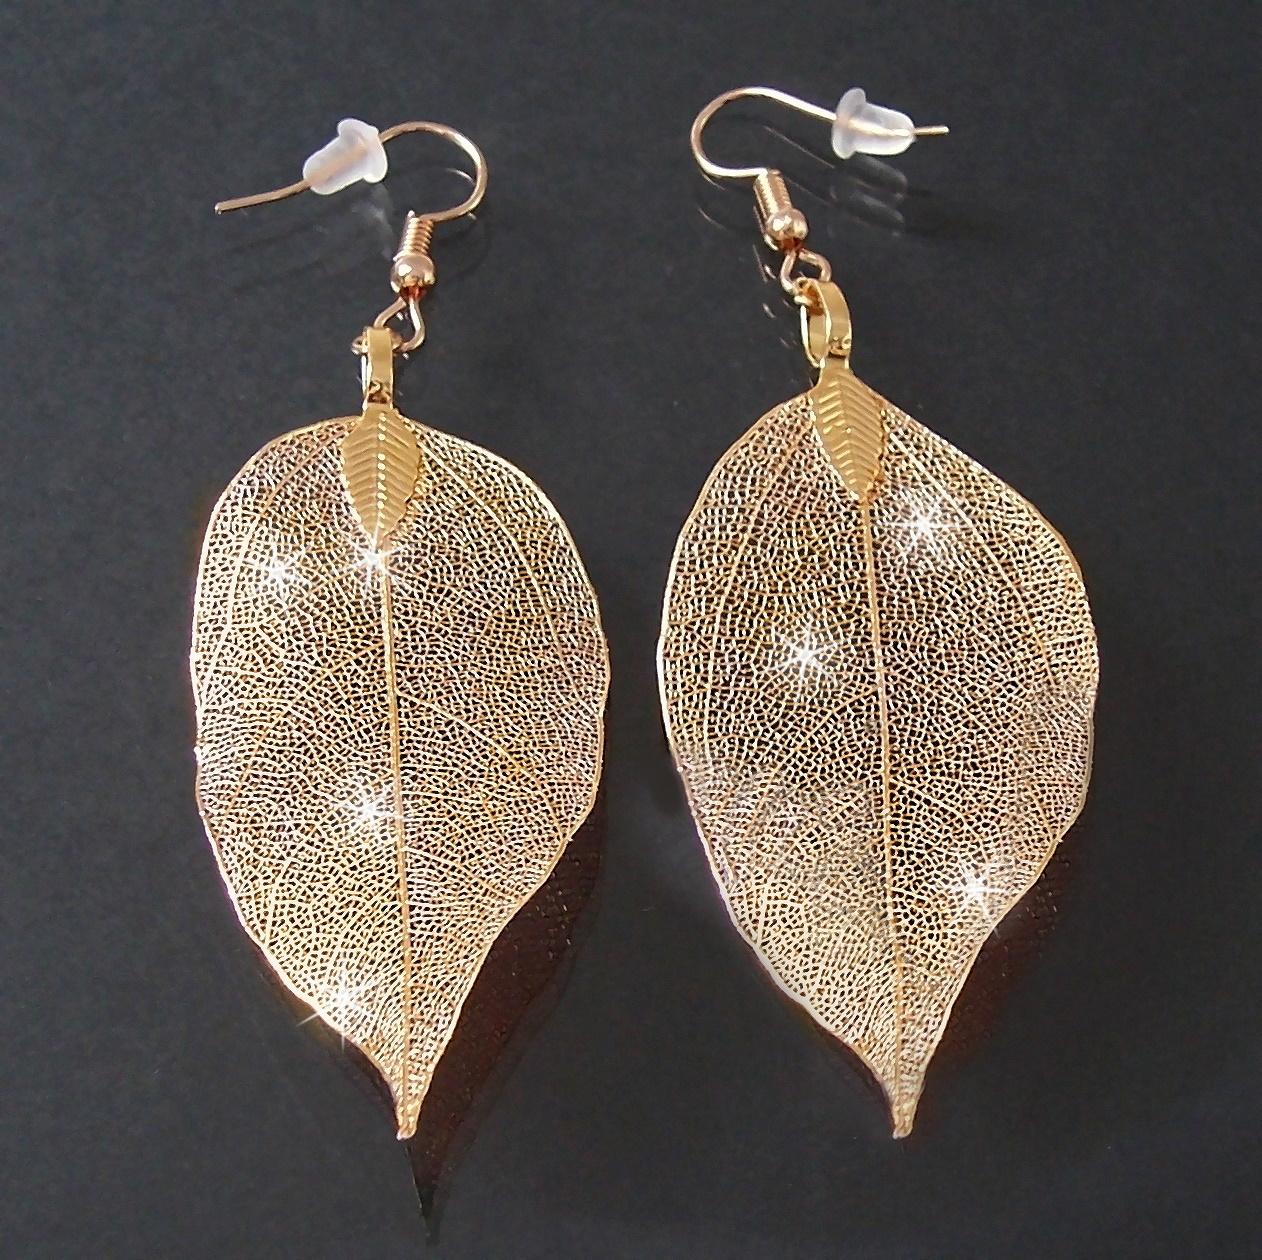 Ohrringe Anhänger Blatt glitzerfrosted Gold Blattohrringe 4cm O77753